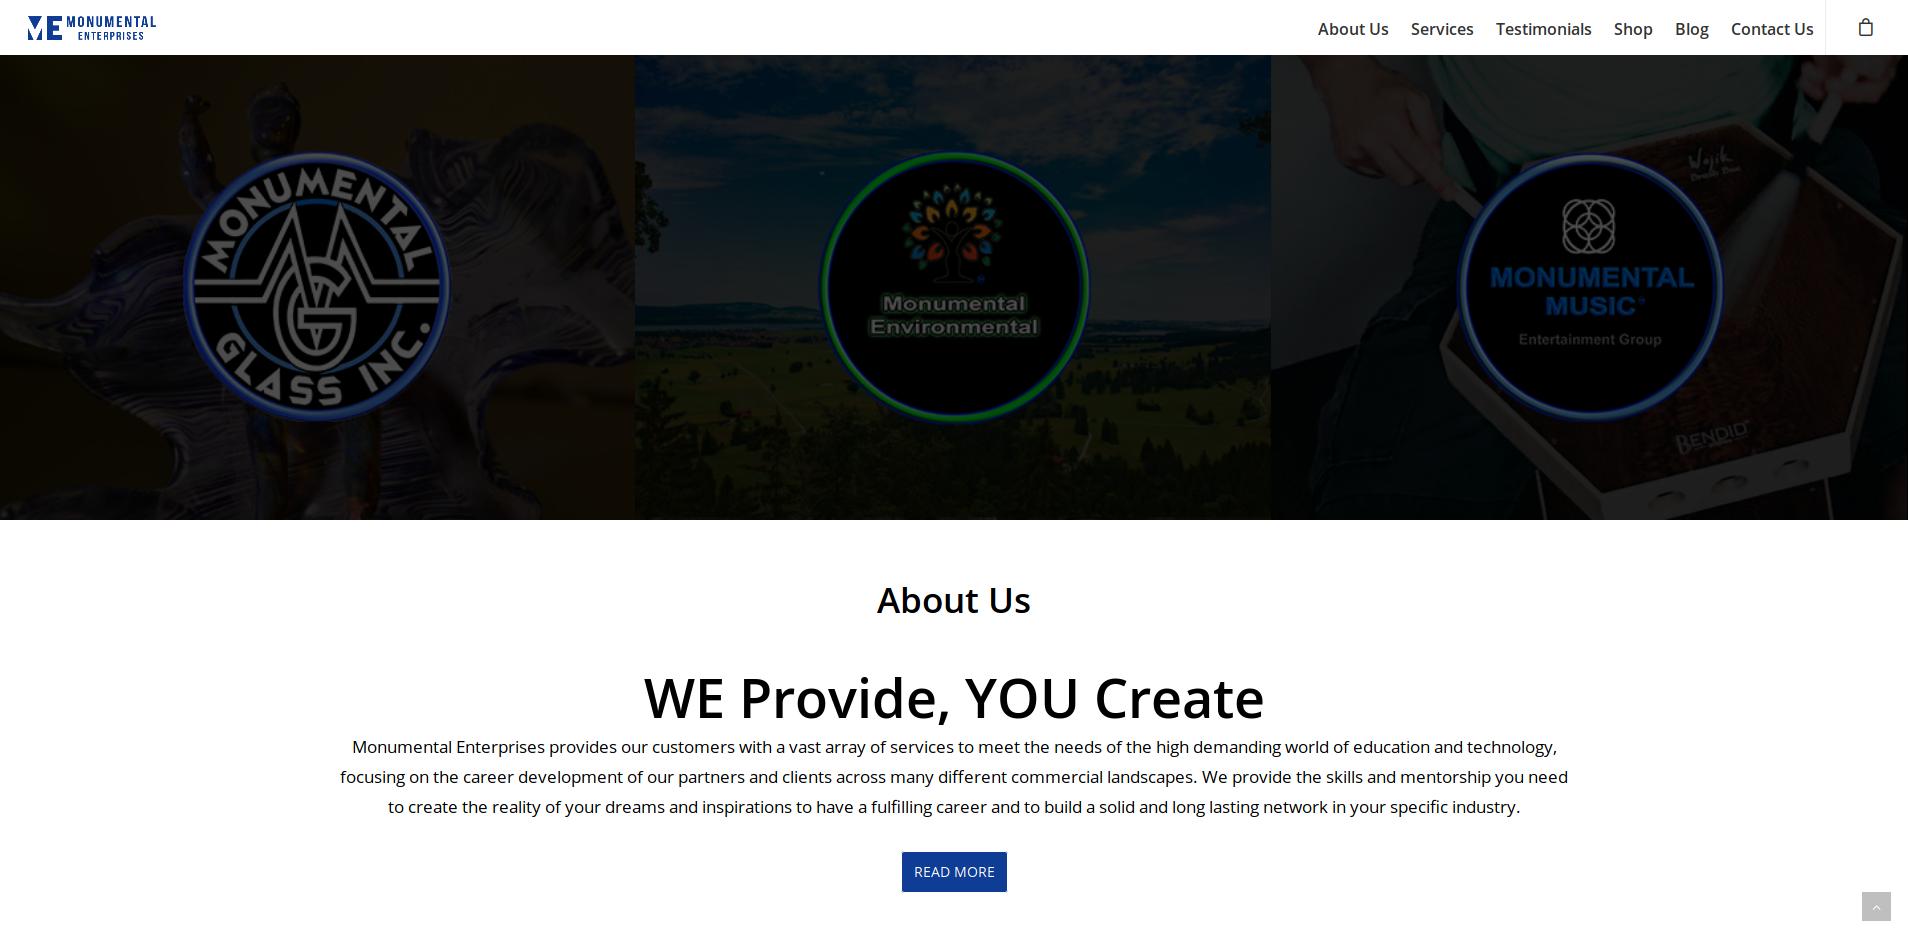 Monumental Enterprises